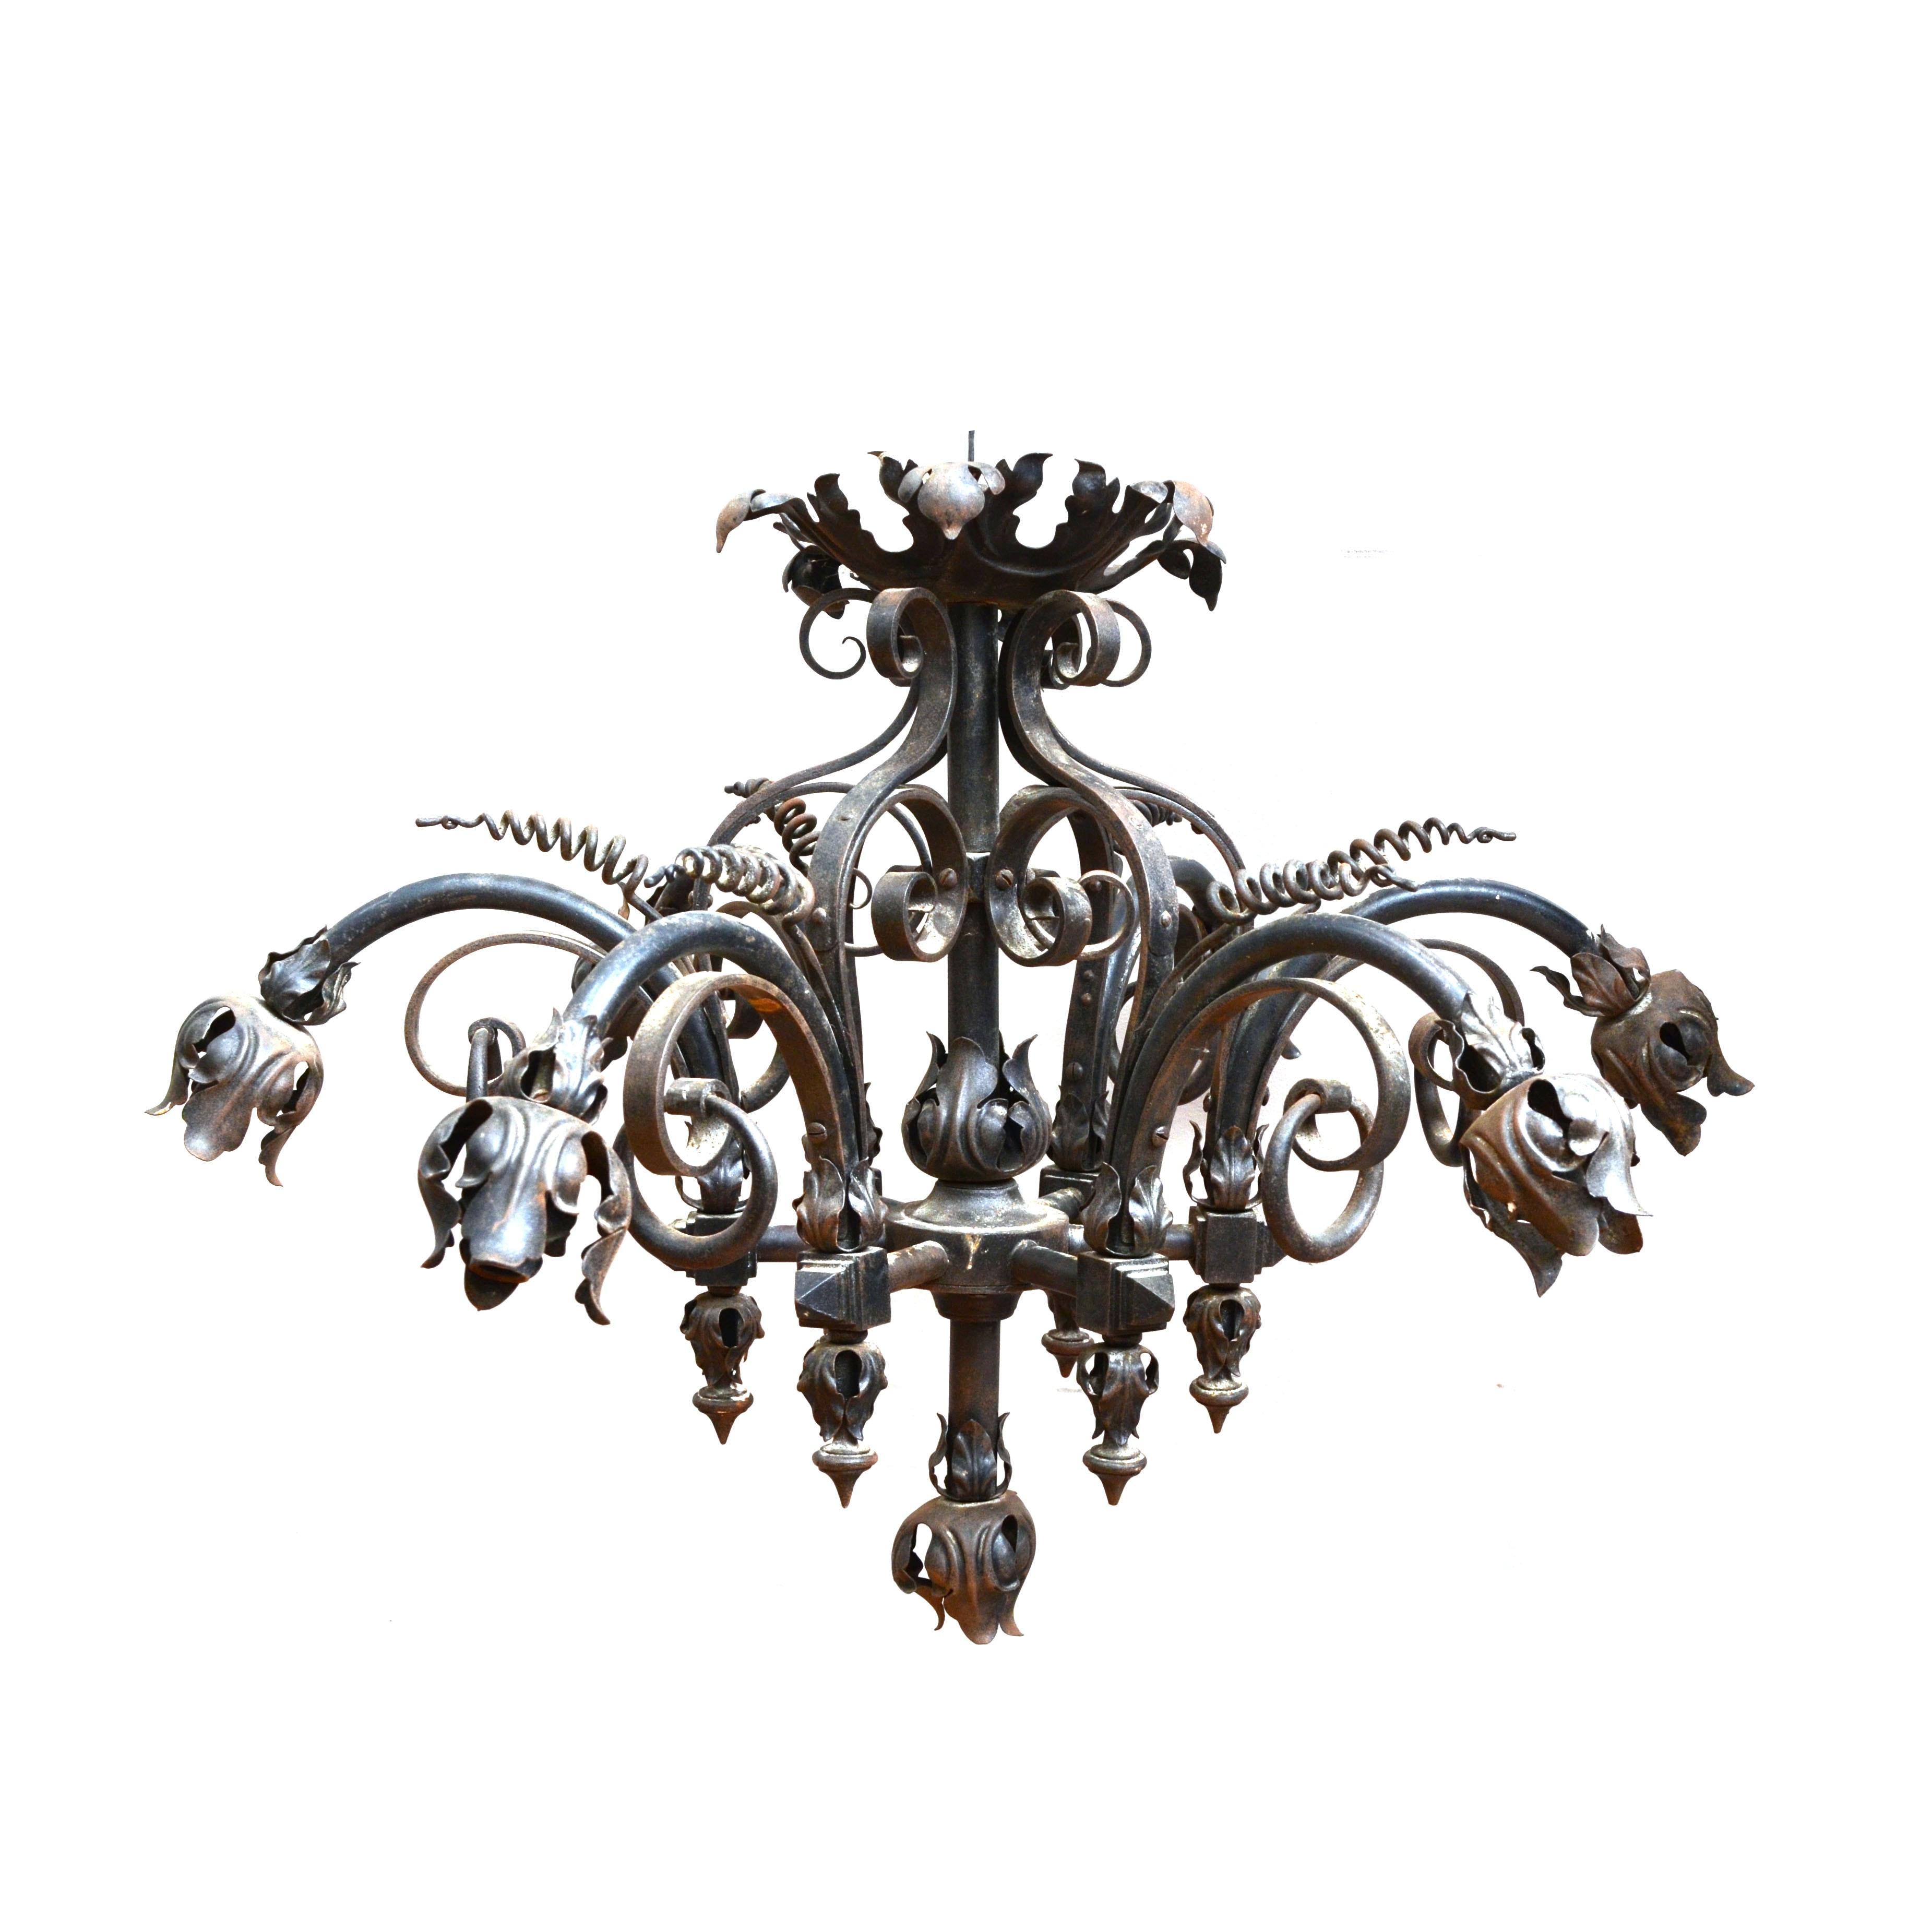 Antique Wrought Iron Ornate Foliate Chandelier